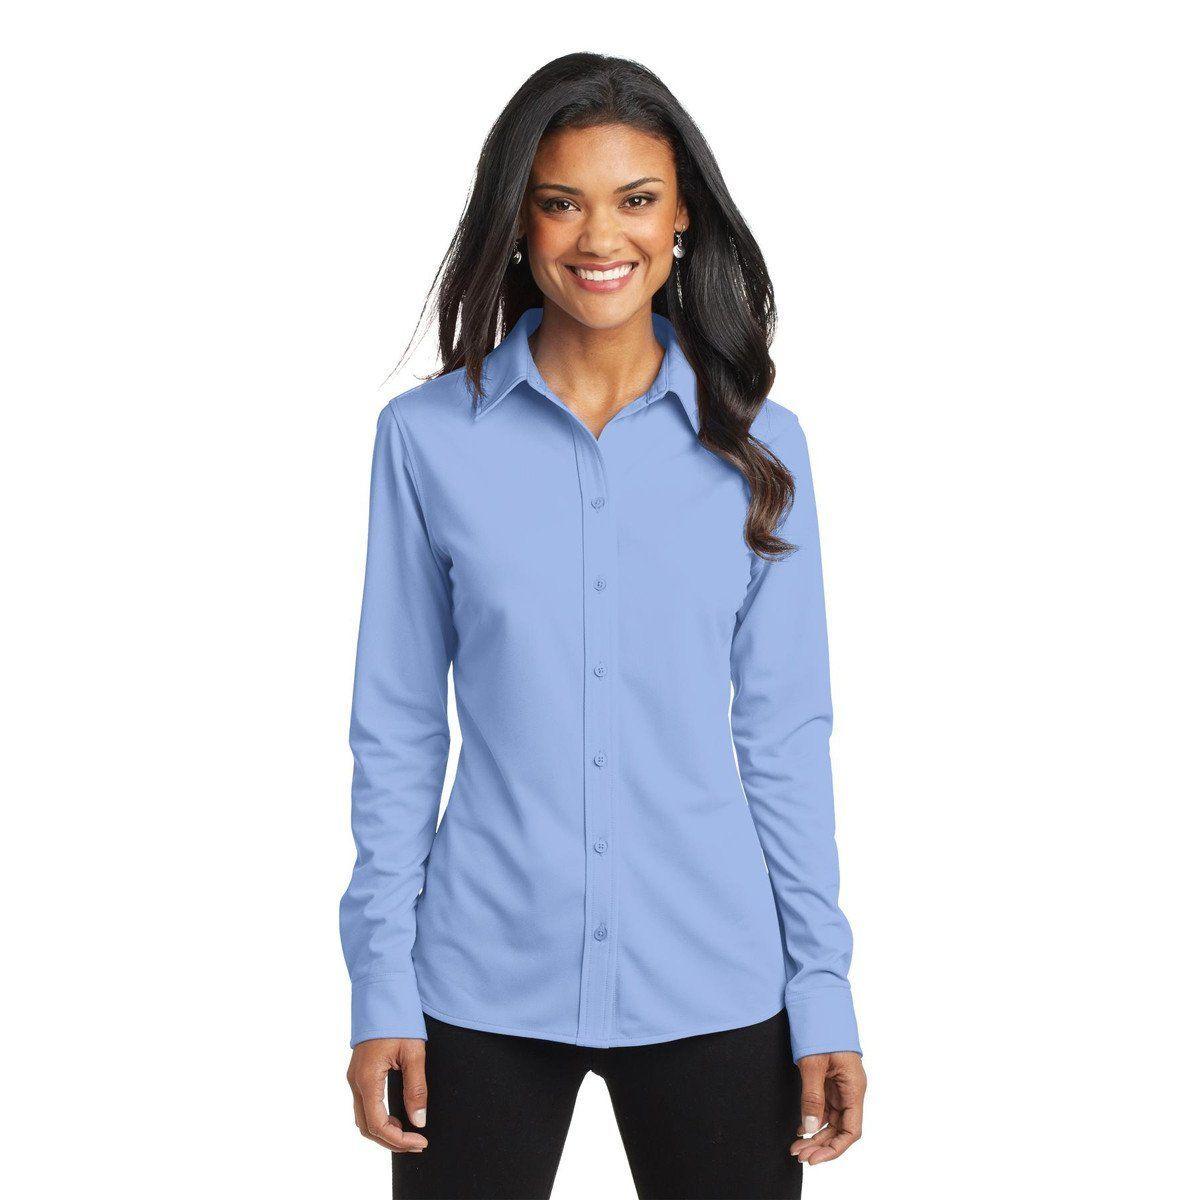 Port Authority Womens Dress Shirt Blue Dimension Knit Dress Shirt